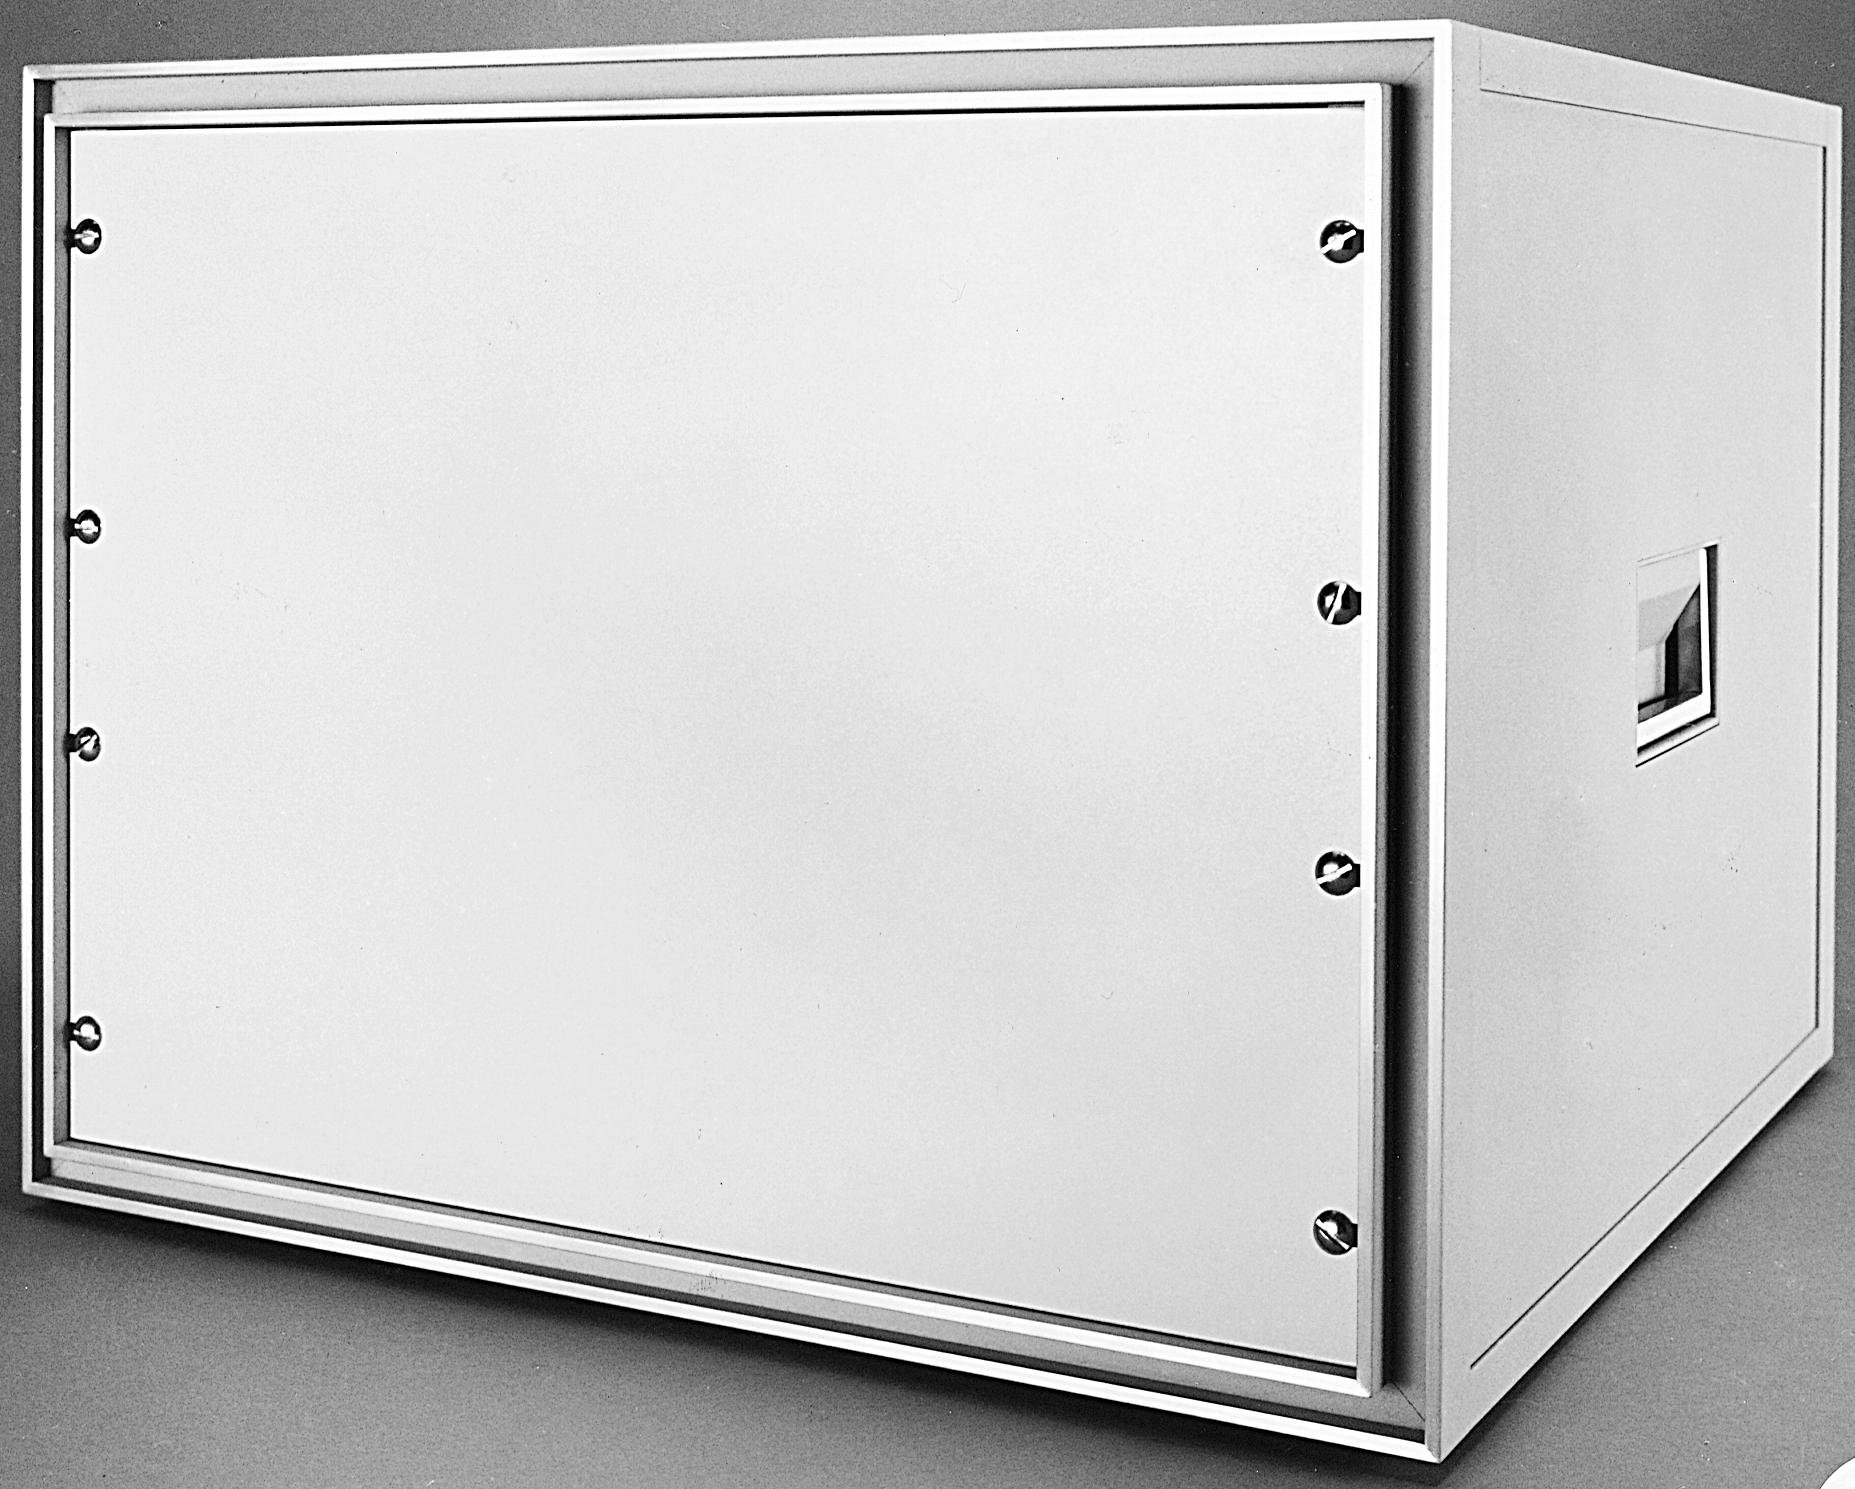 EC-9903-S - 19 Case, Cabinet, Sand, 5U, Steel, Portable, 275 mm, 535 mm, 394 mm (EC-9903-S)